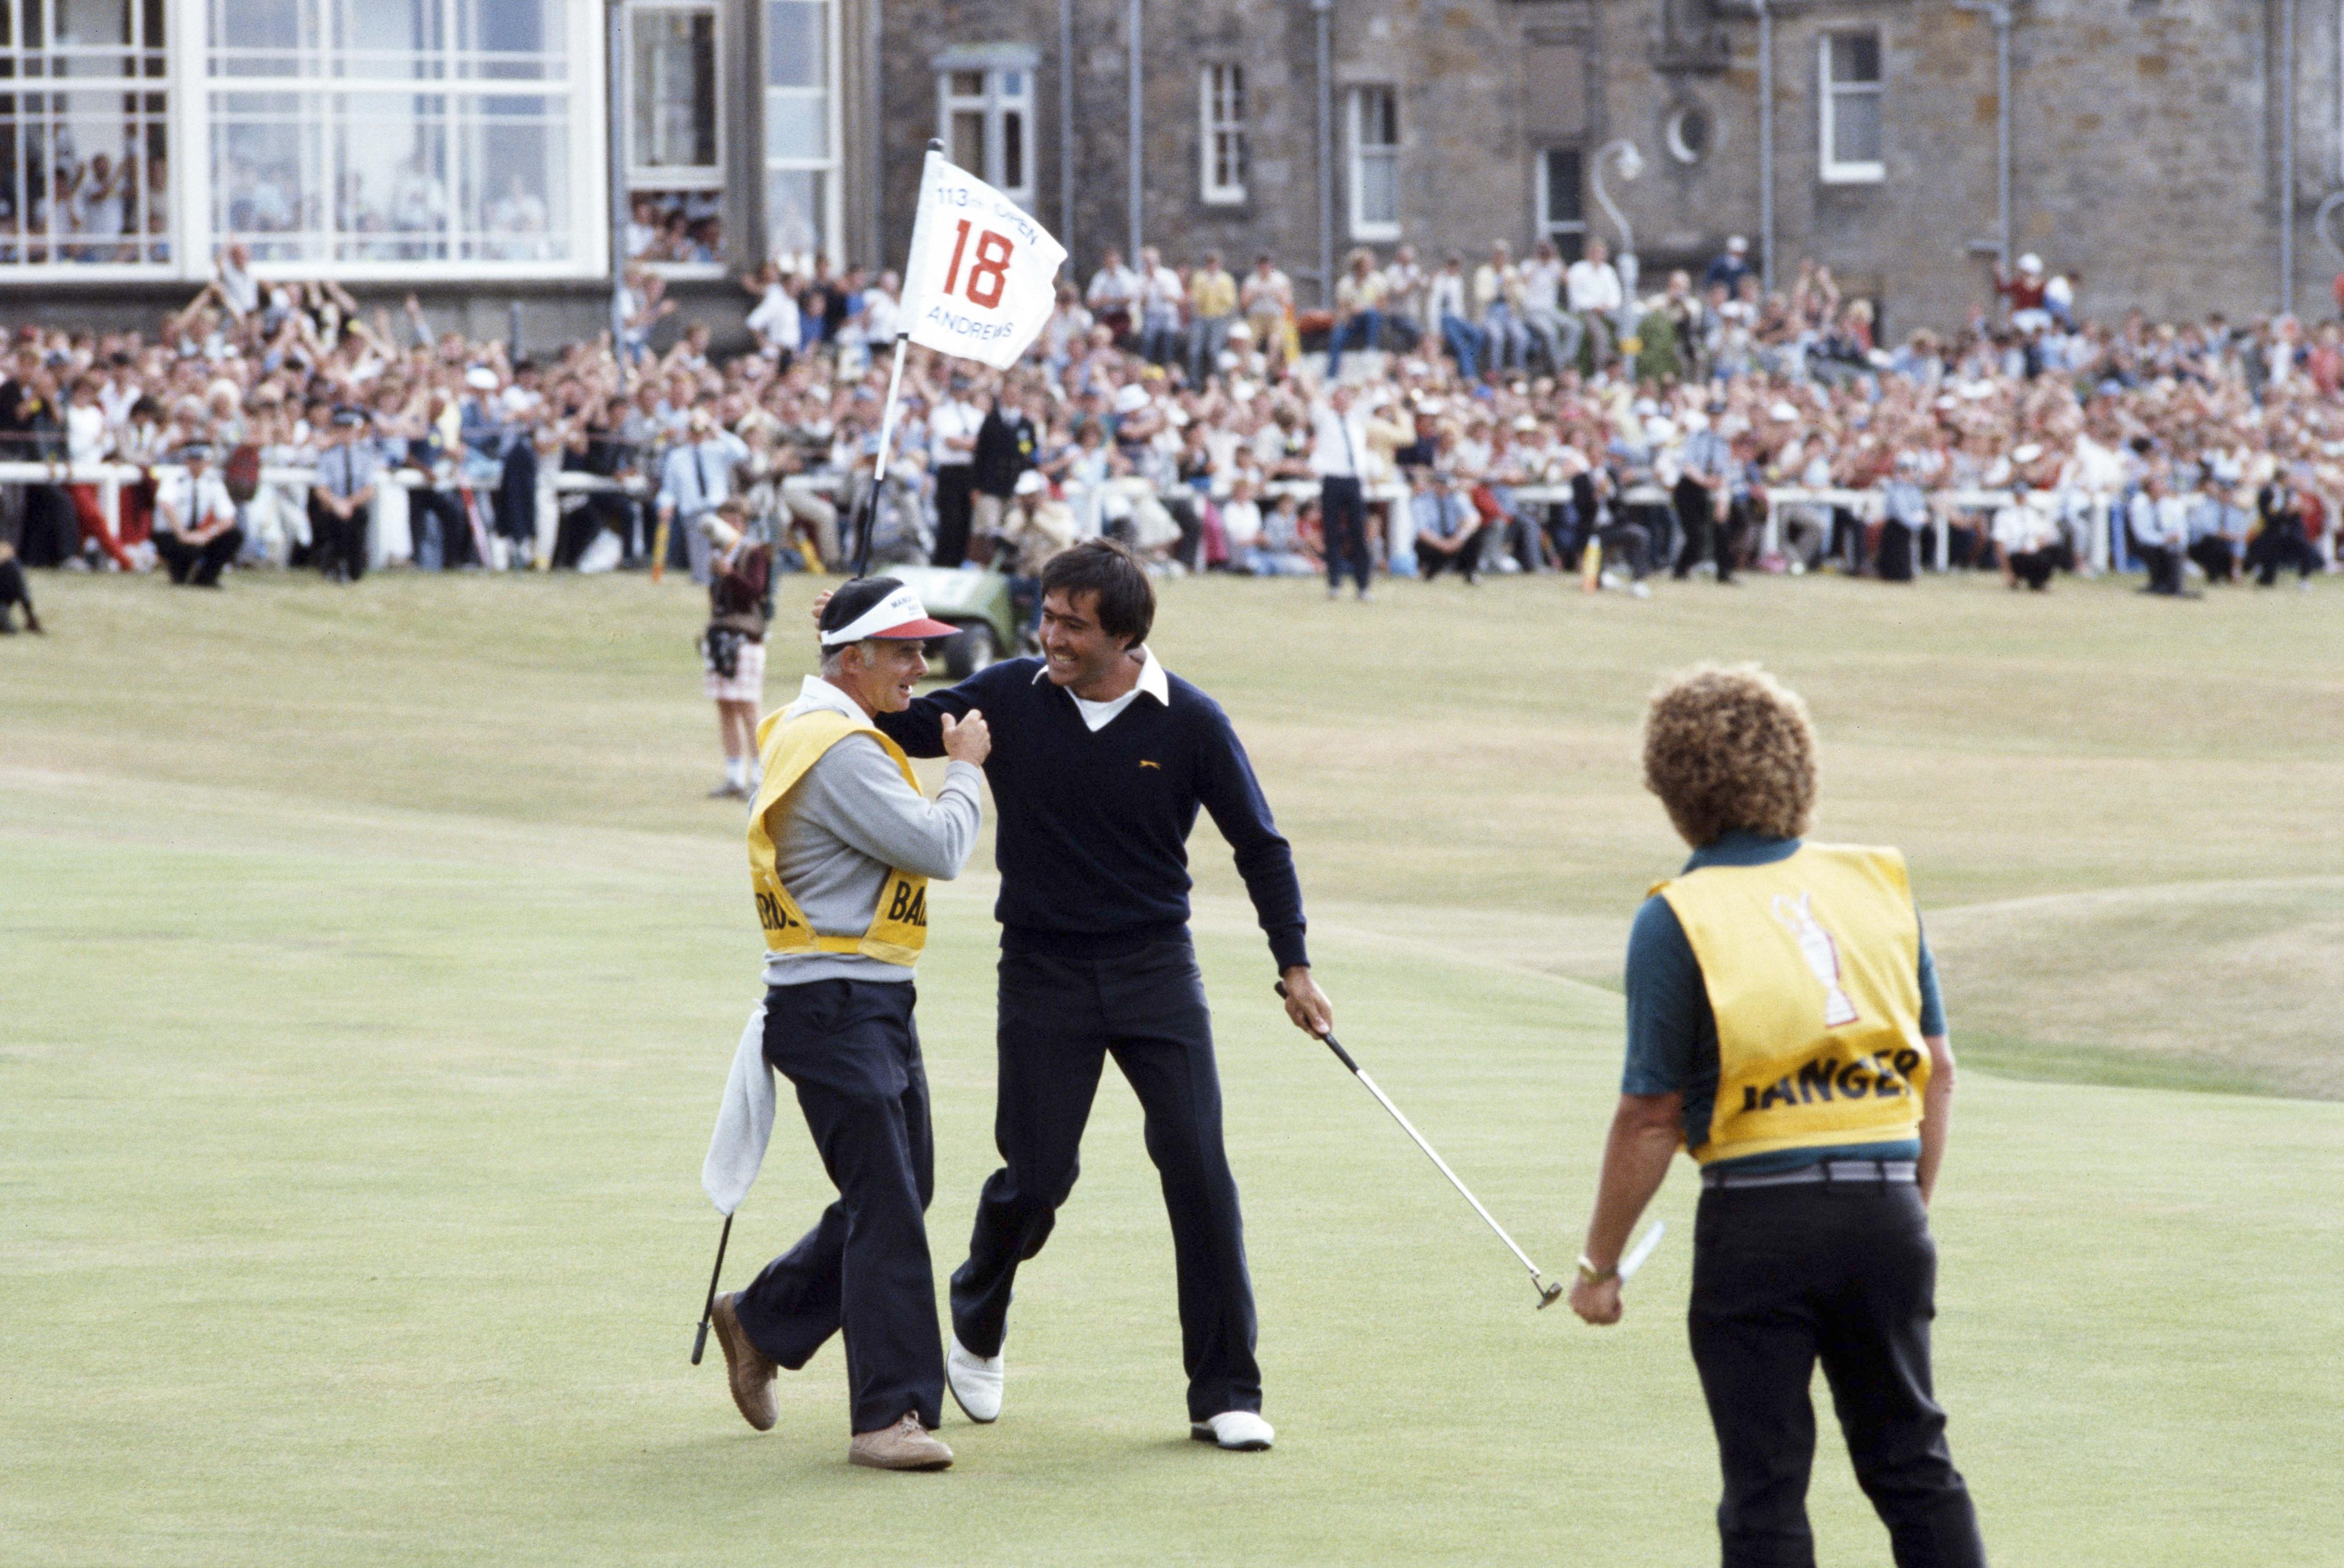 6. 1984 Open Championship